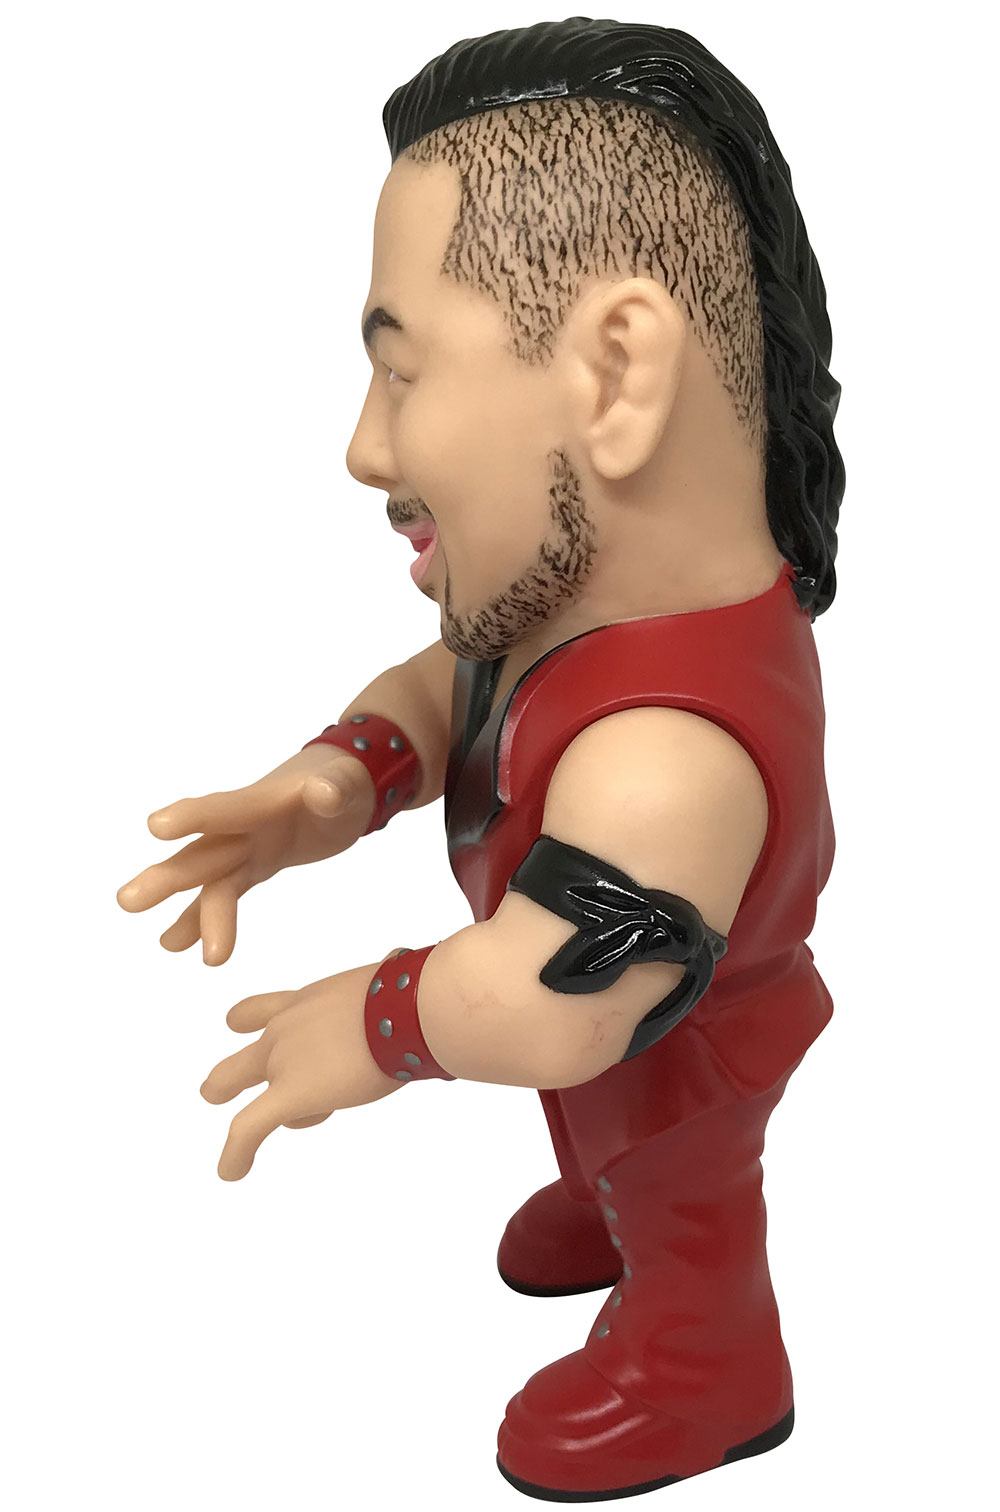 16dソフビコレクション004 WWE 中邑真輔